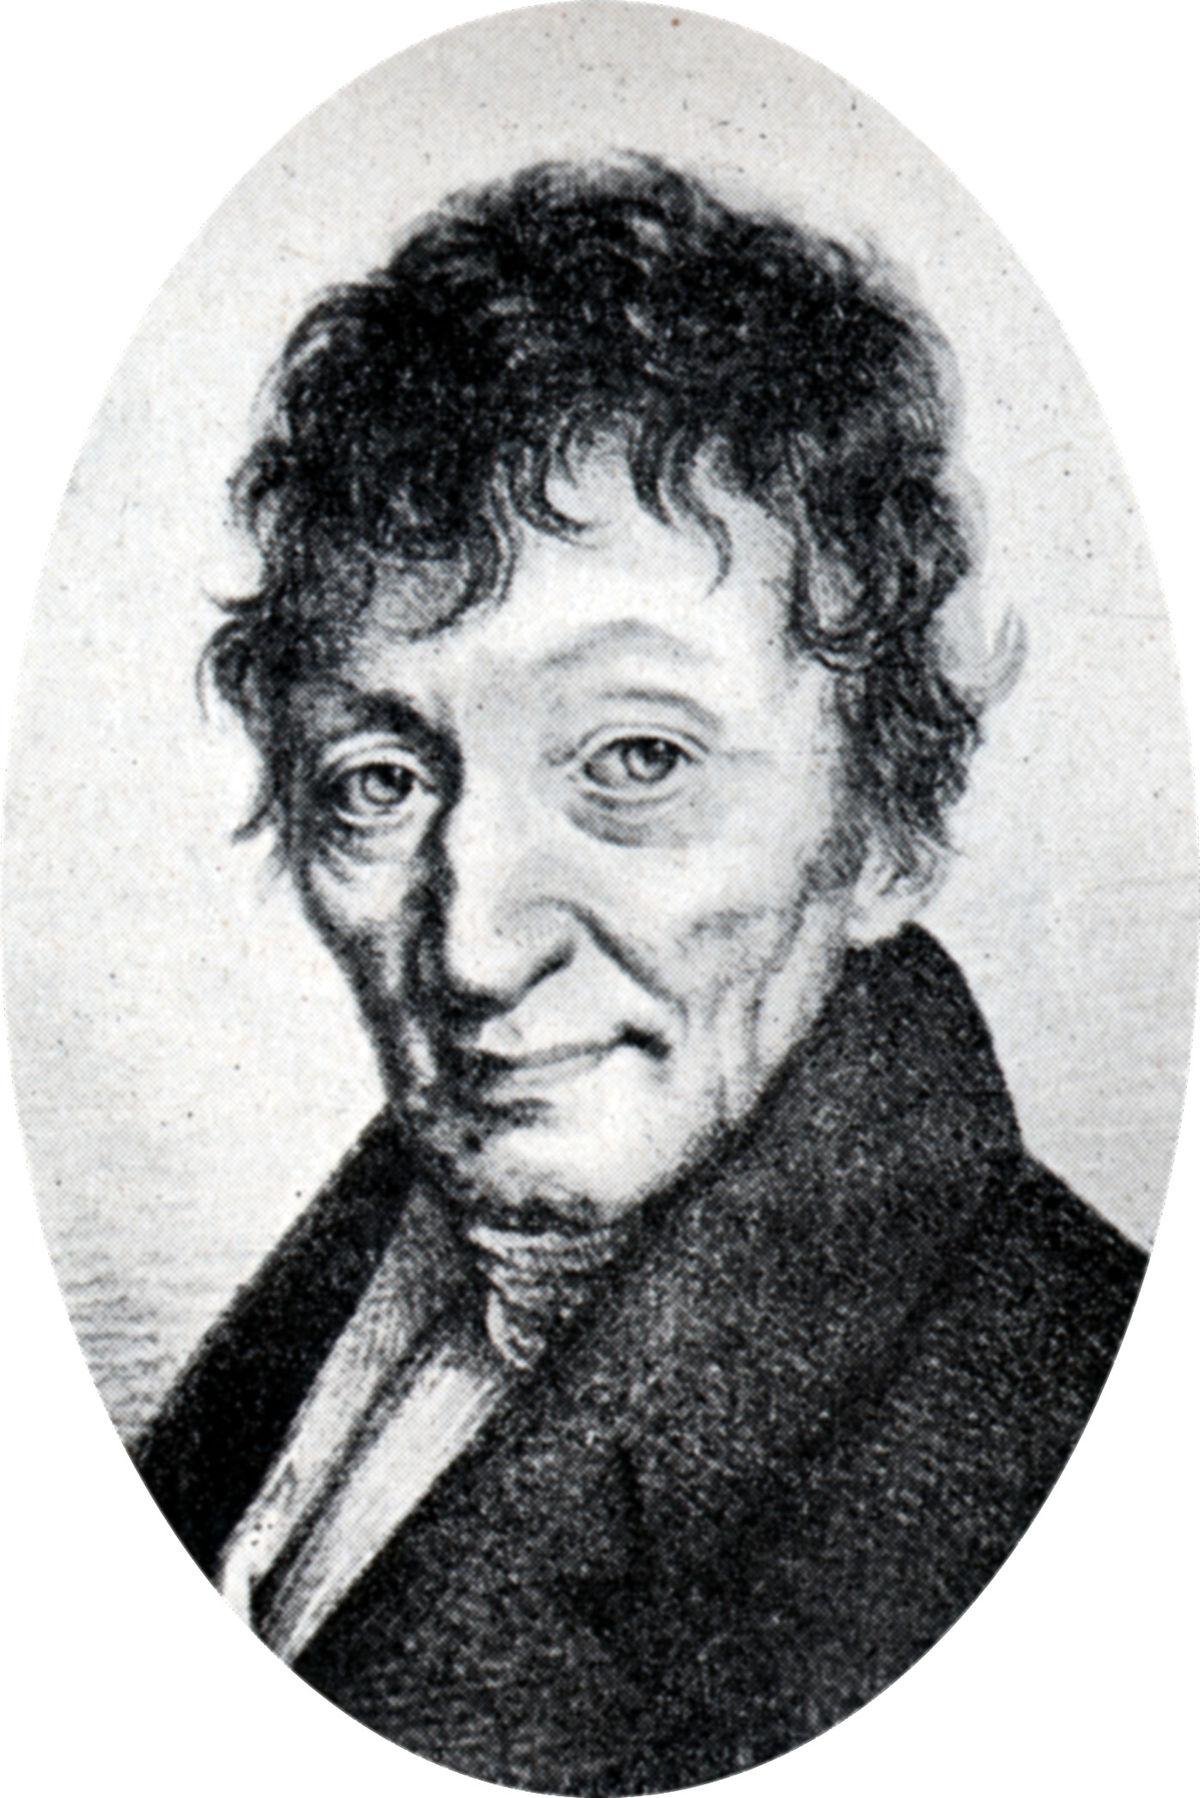 LM Aubert Du Petit-Thouars 1758-1831.jpg